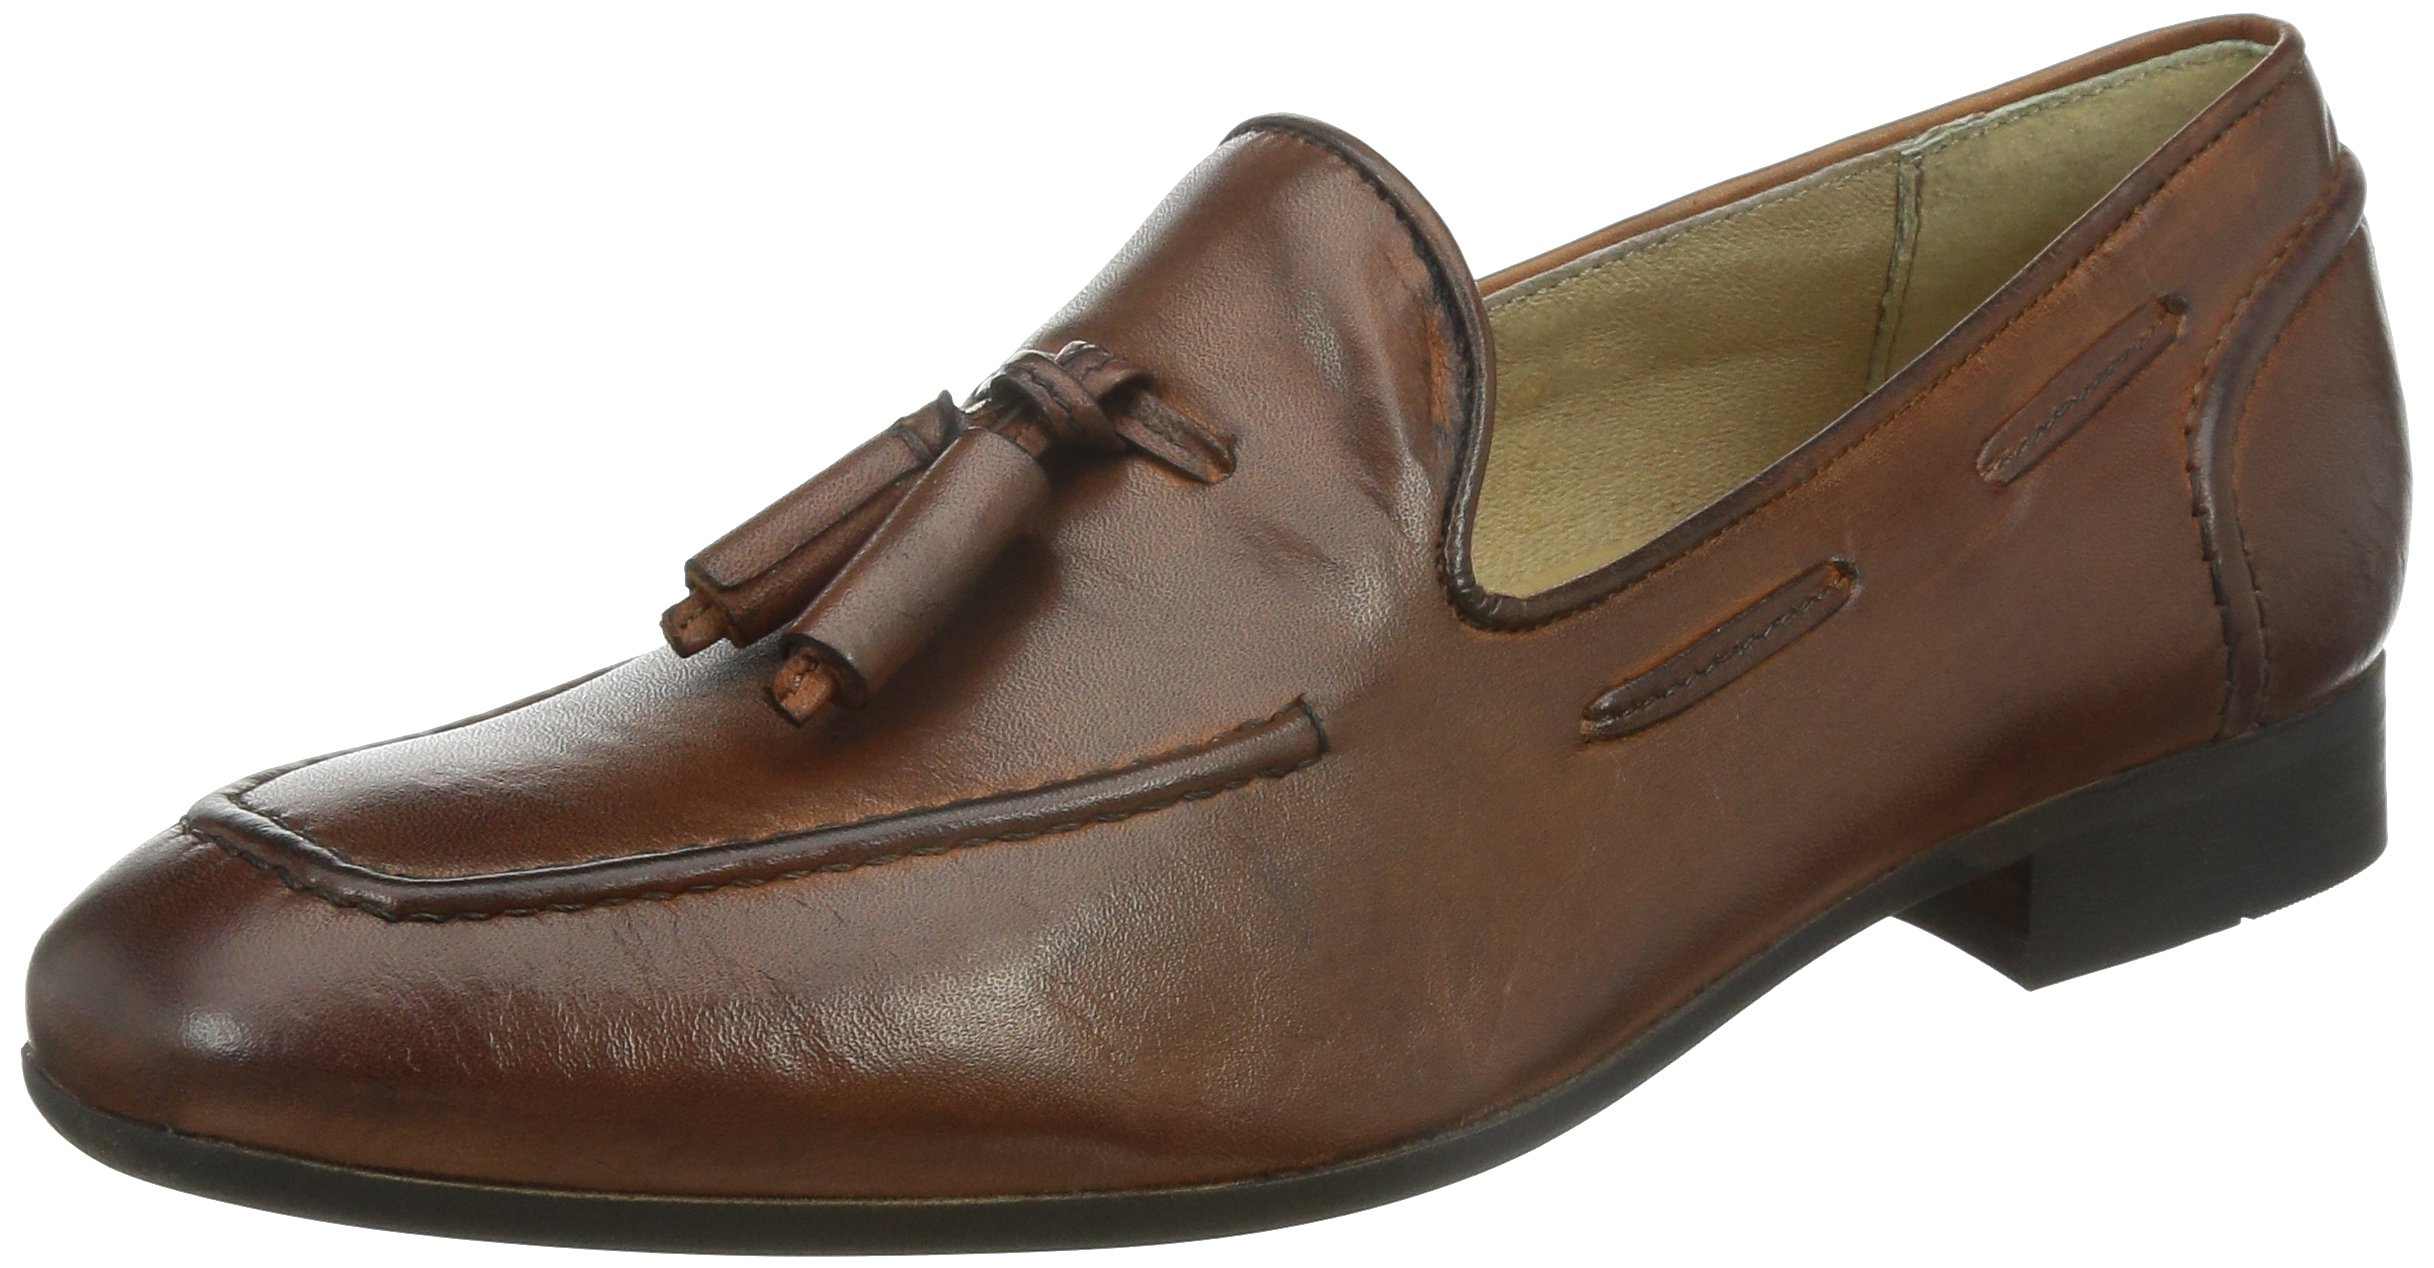 H by Hudson Men's Pierre Slip-On Loafer, Tan, 43 EU/10 M US